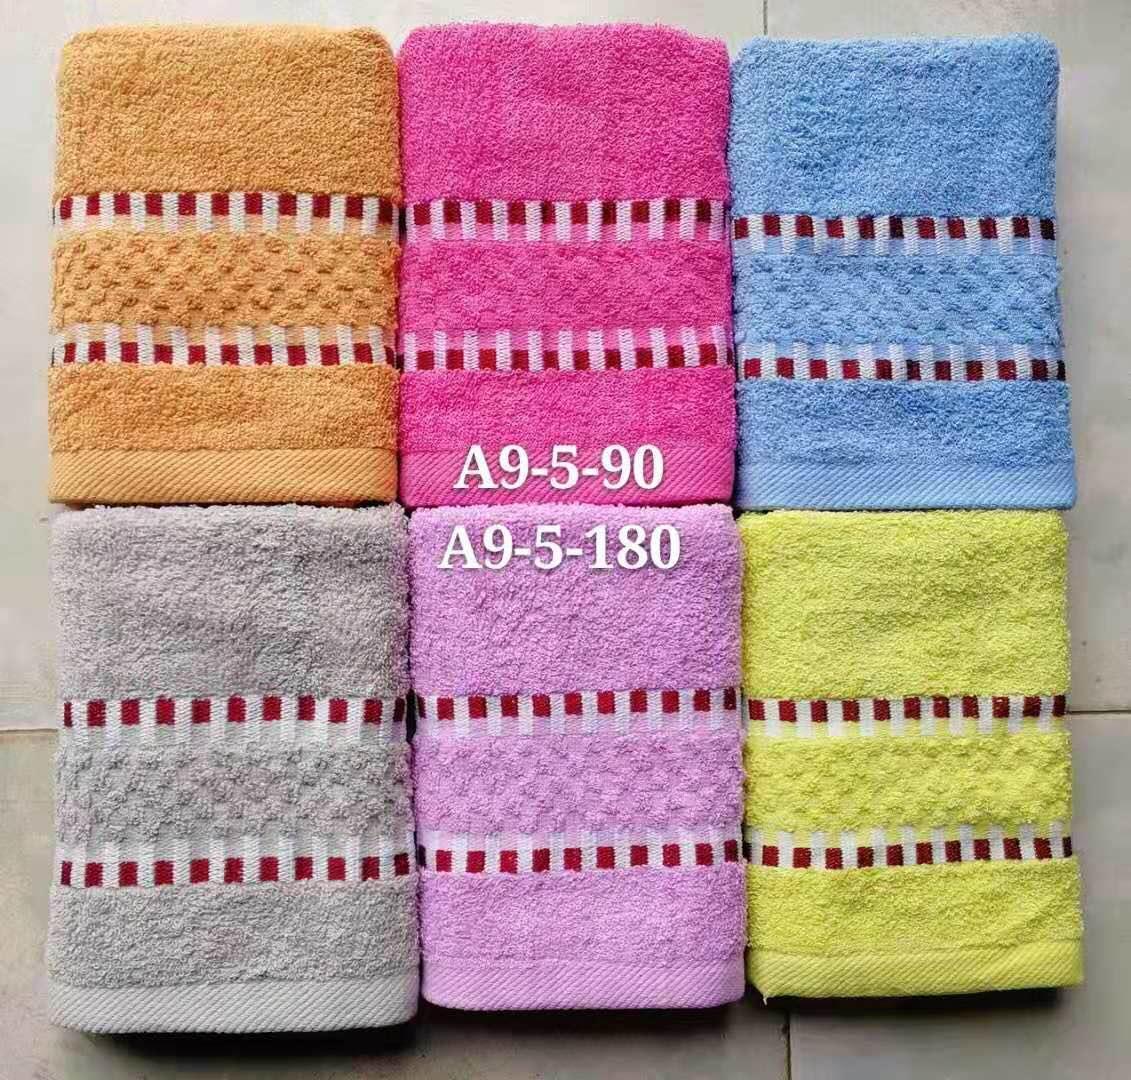 Банное полотенце. Размер: 140 * 70